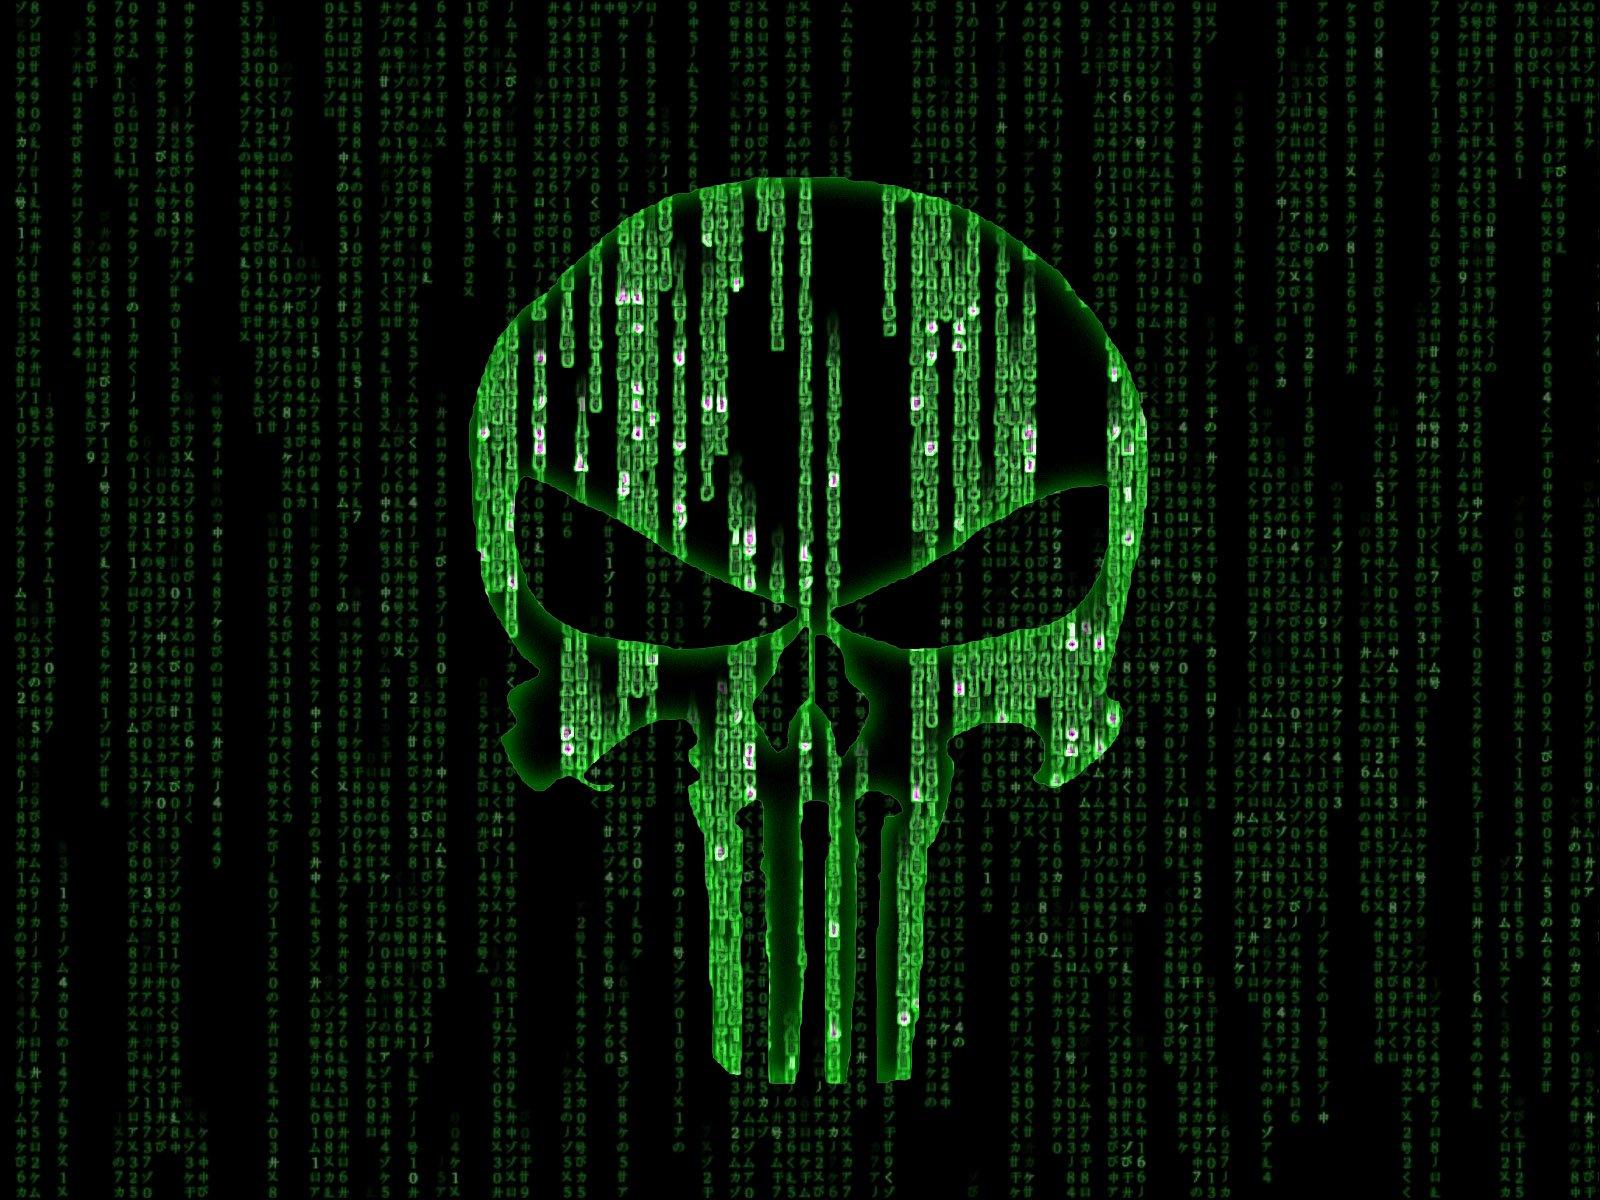 Pics photos abstract green wallpaper network - 3d Hacker Wallpaper Wallpapersafari